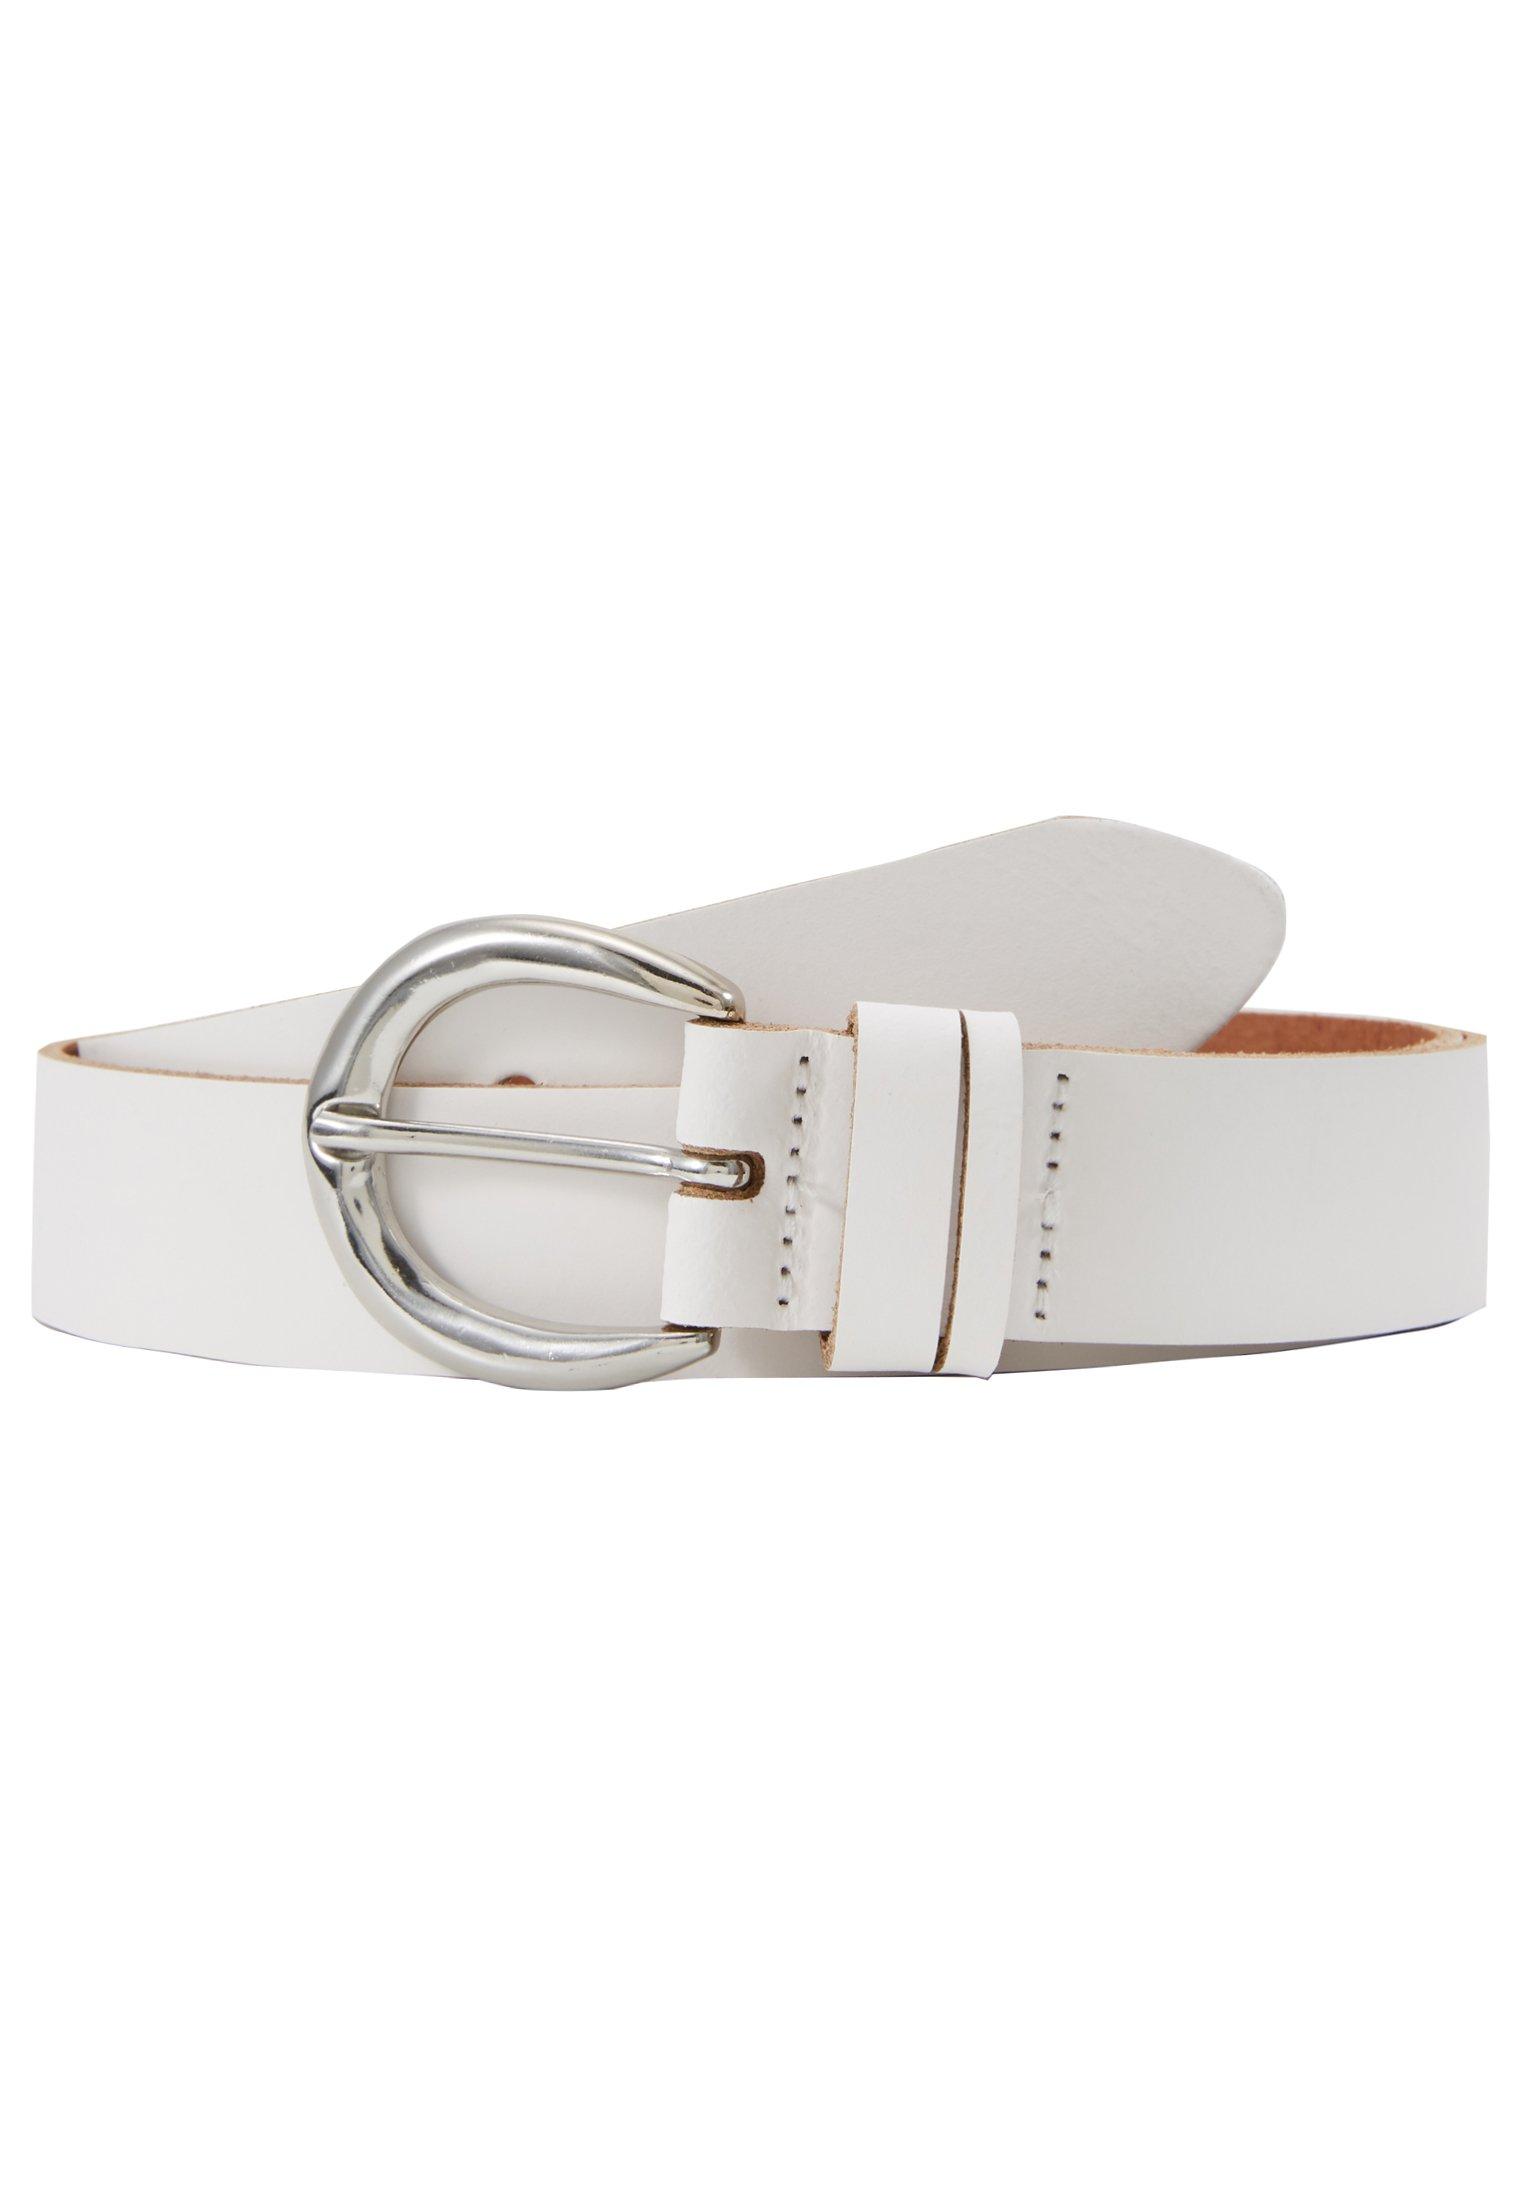 TOM TAILOR DENIM Belte - white/hvit 4u5EdxdyX4ecHph